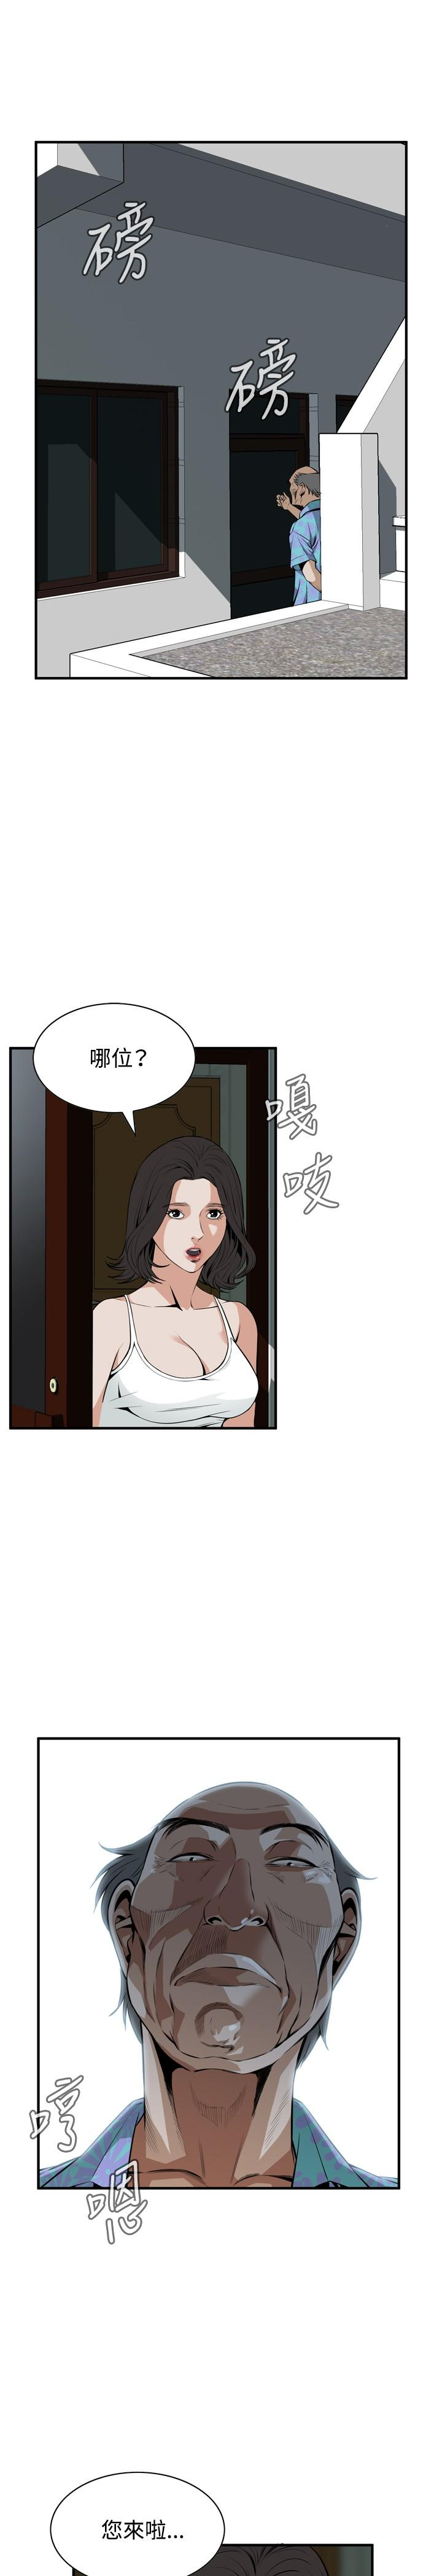 Take a Peek 偷窥 Ch.39~60 [Chinese]中文 113